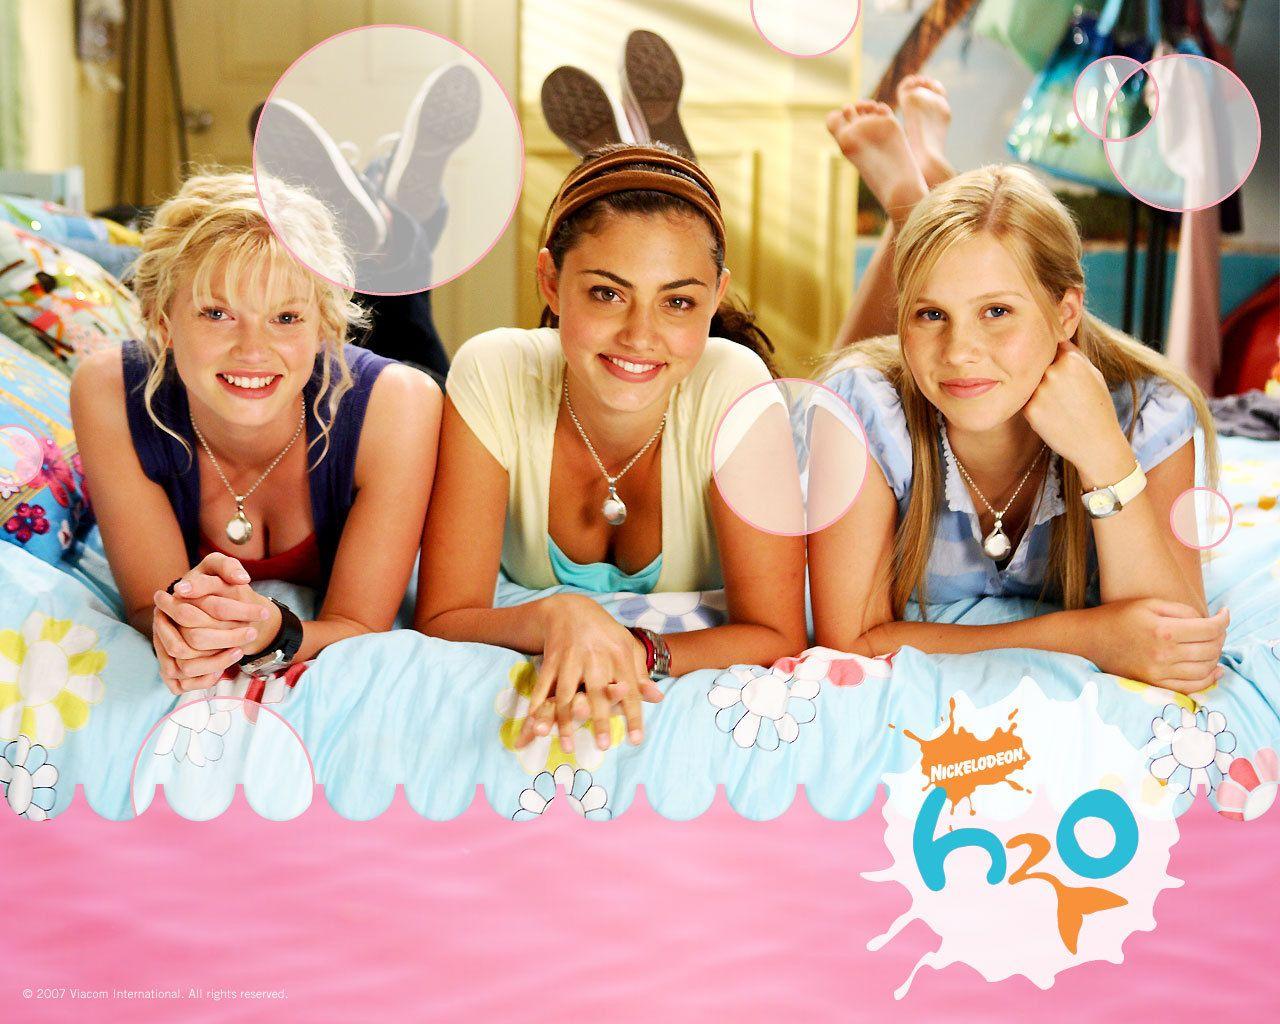 Ausmalbilder H2o Plötzlich Meerjungfrau Emma : H2o Cleo Rikki And Emma There Is Something So Interesting About